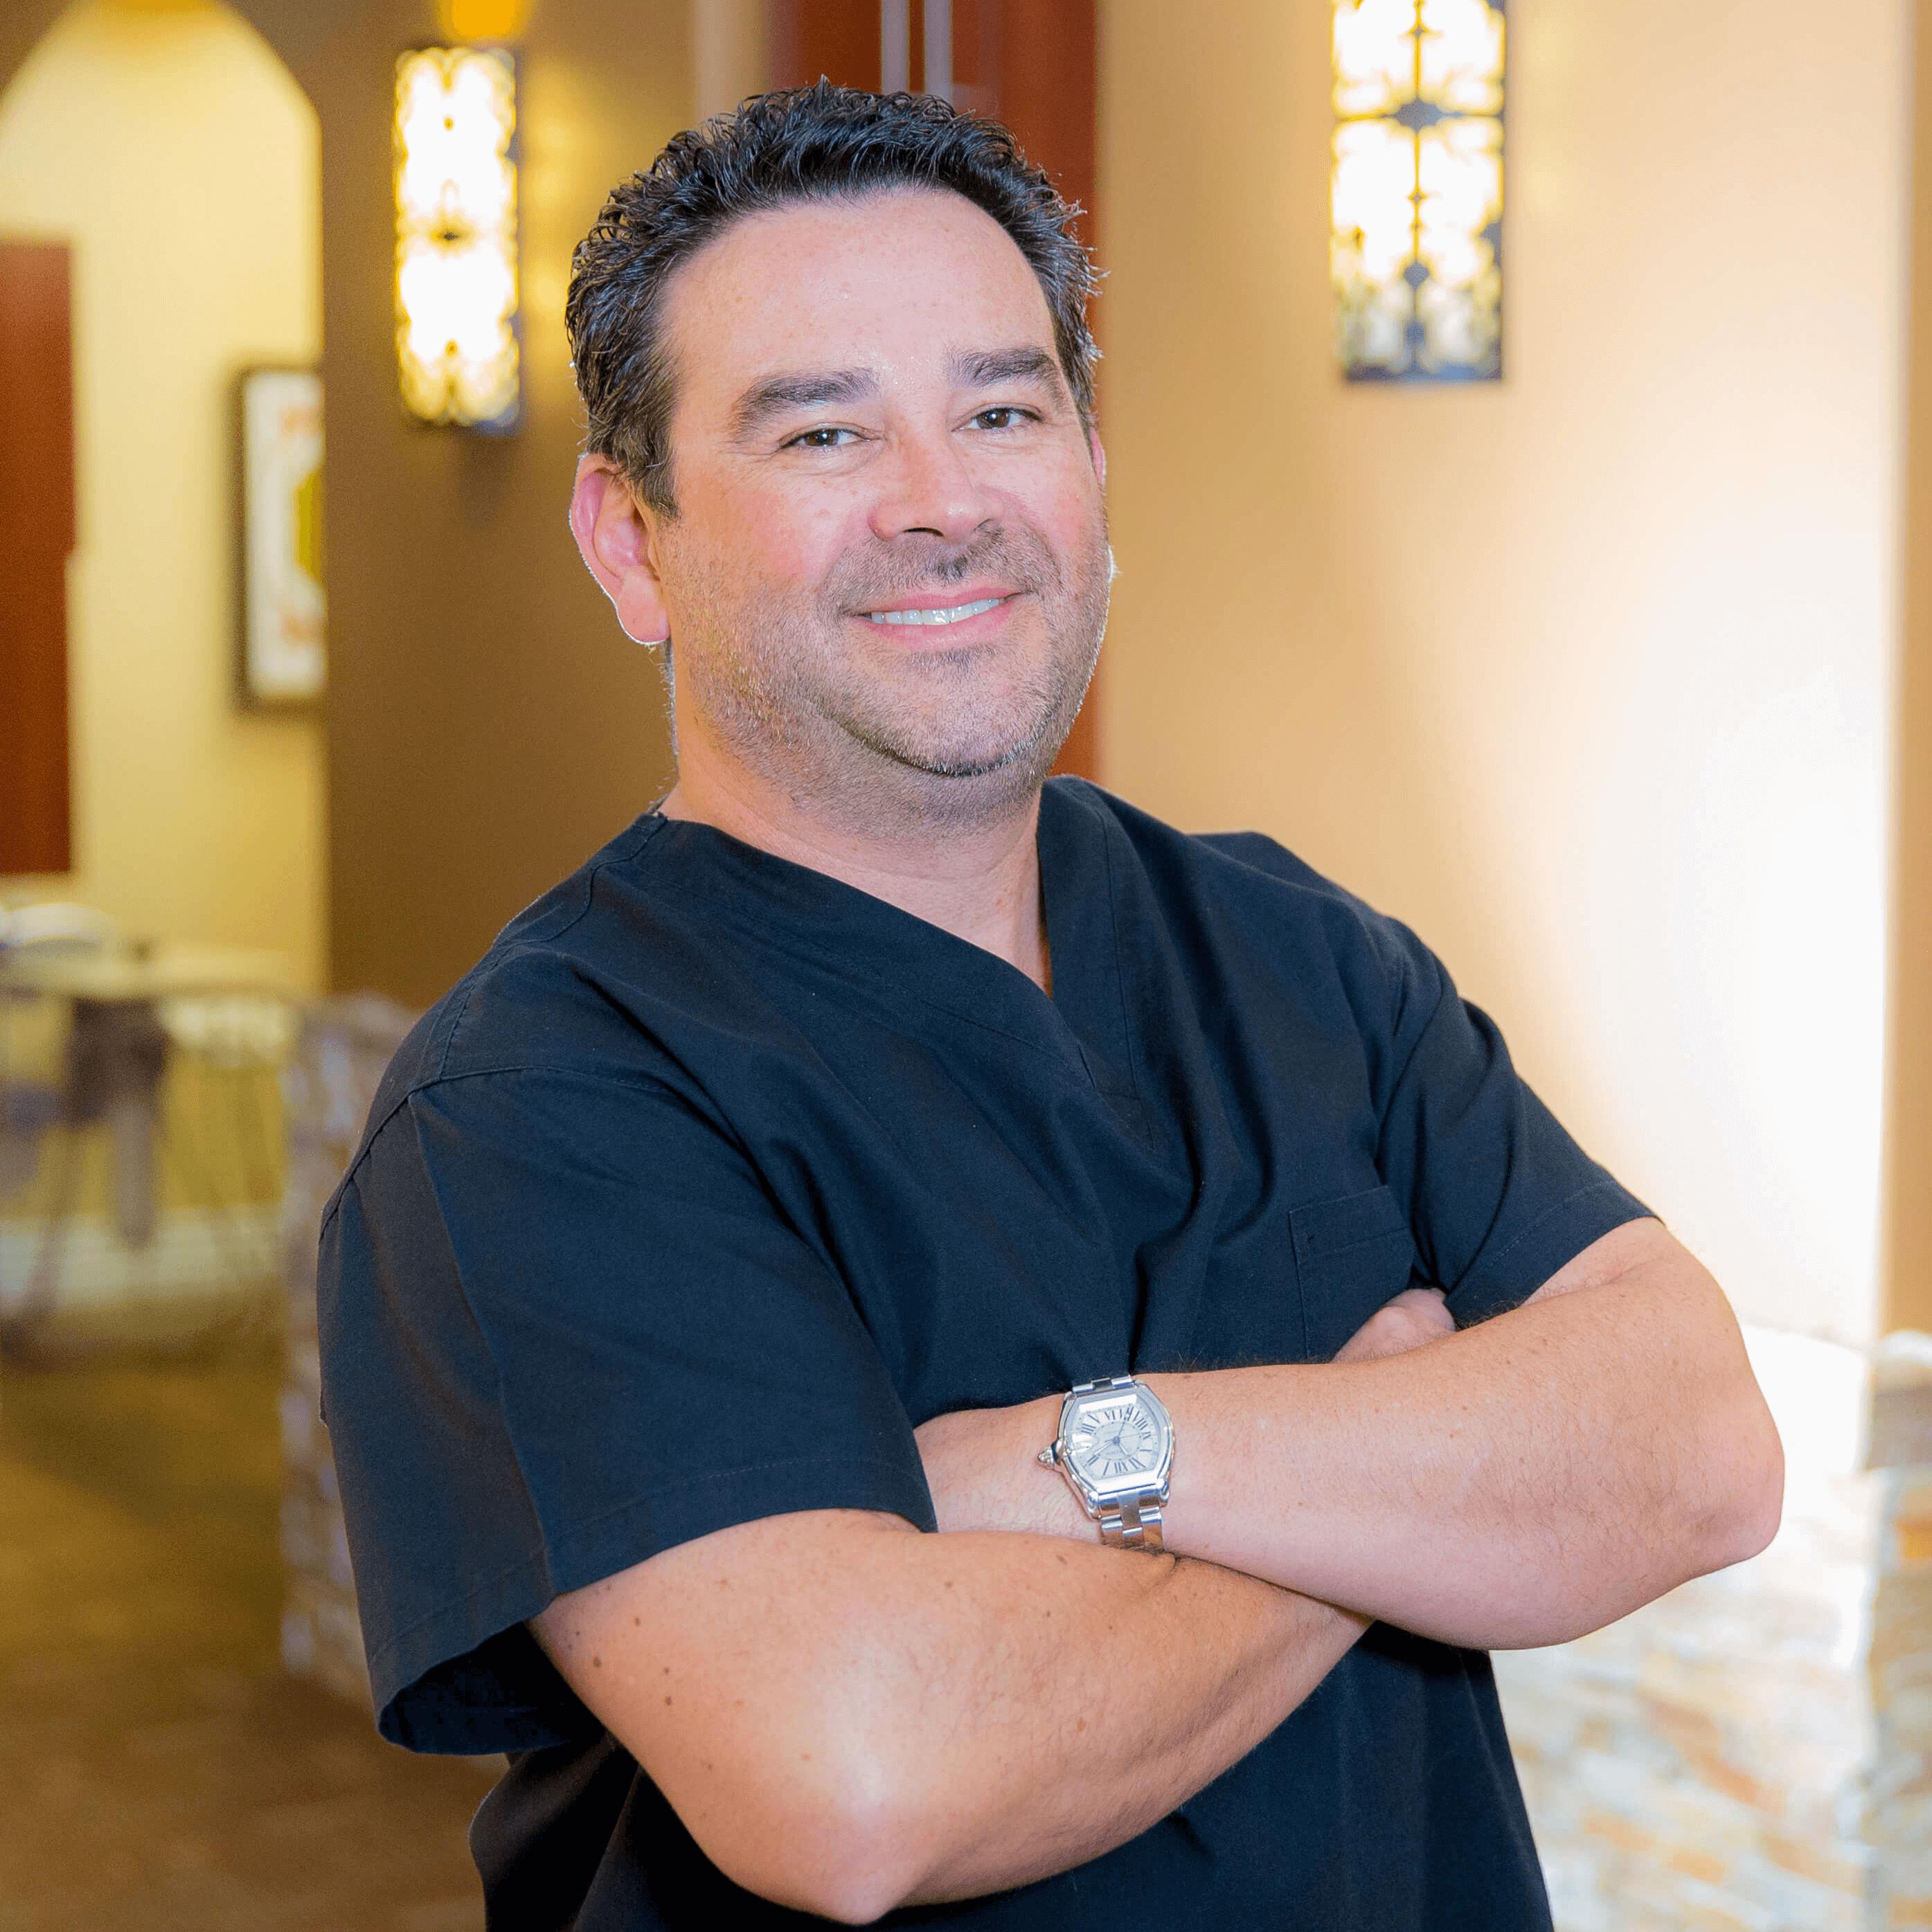 Top Rated Dentists near Murrieta CA